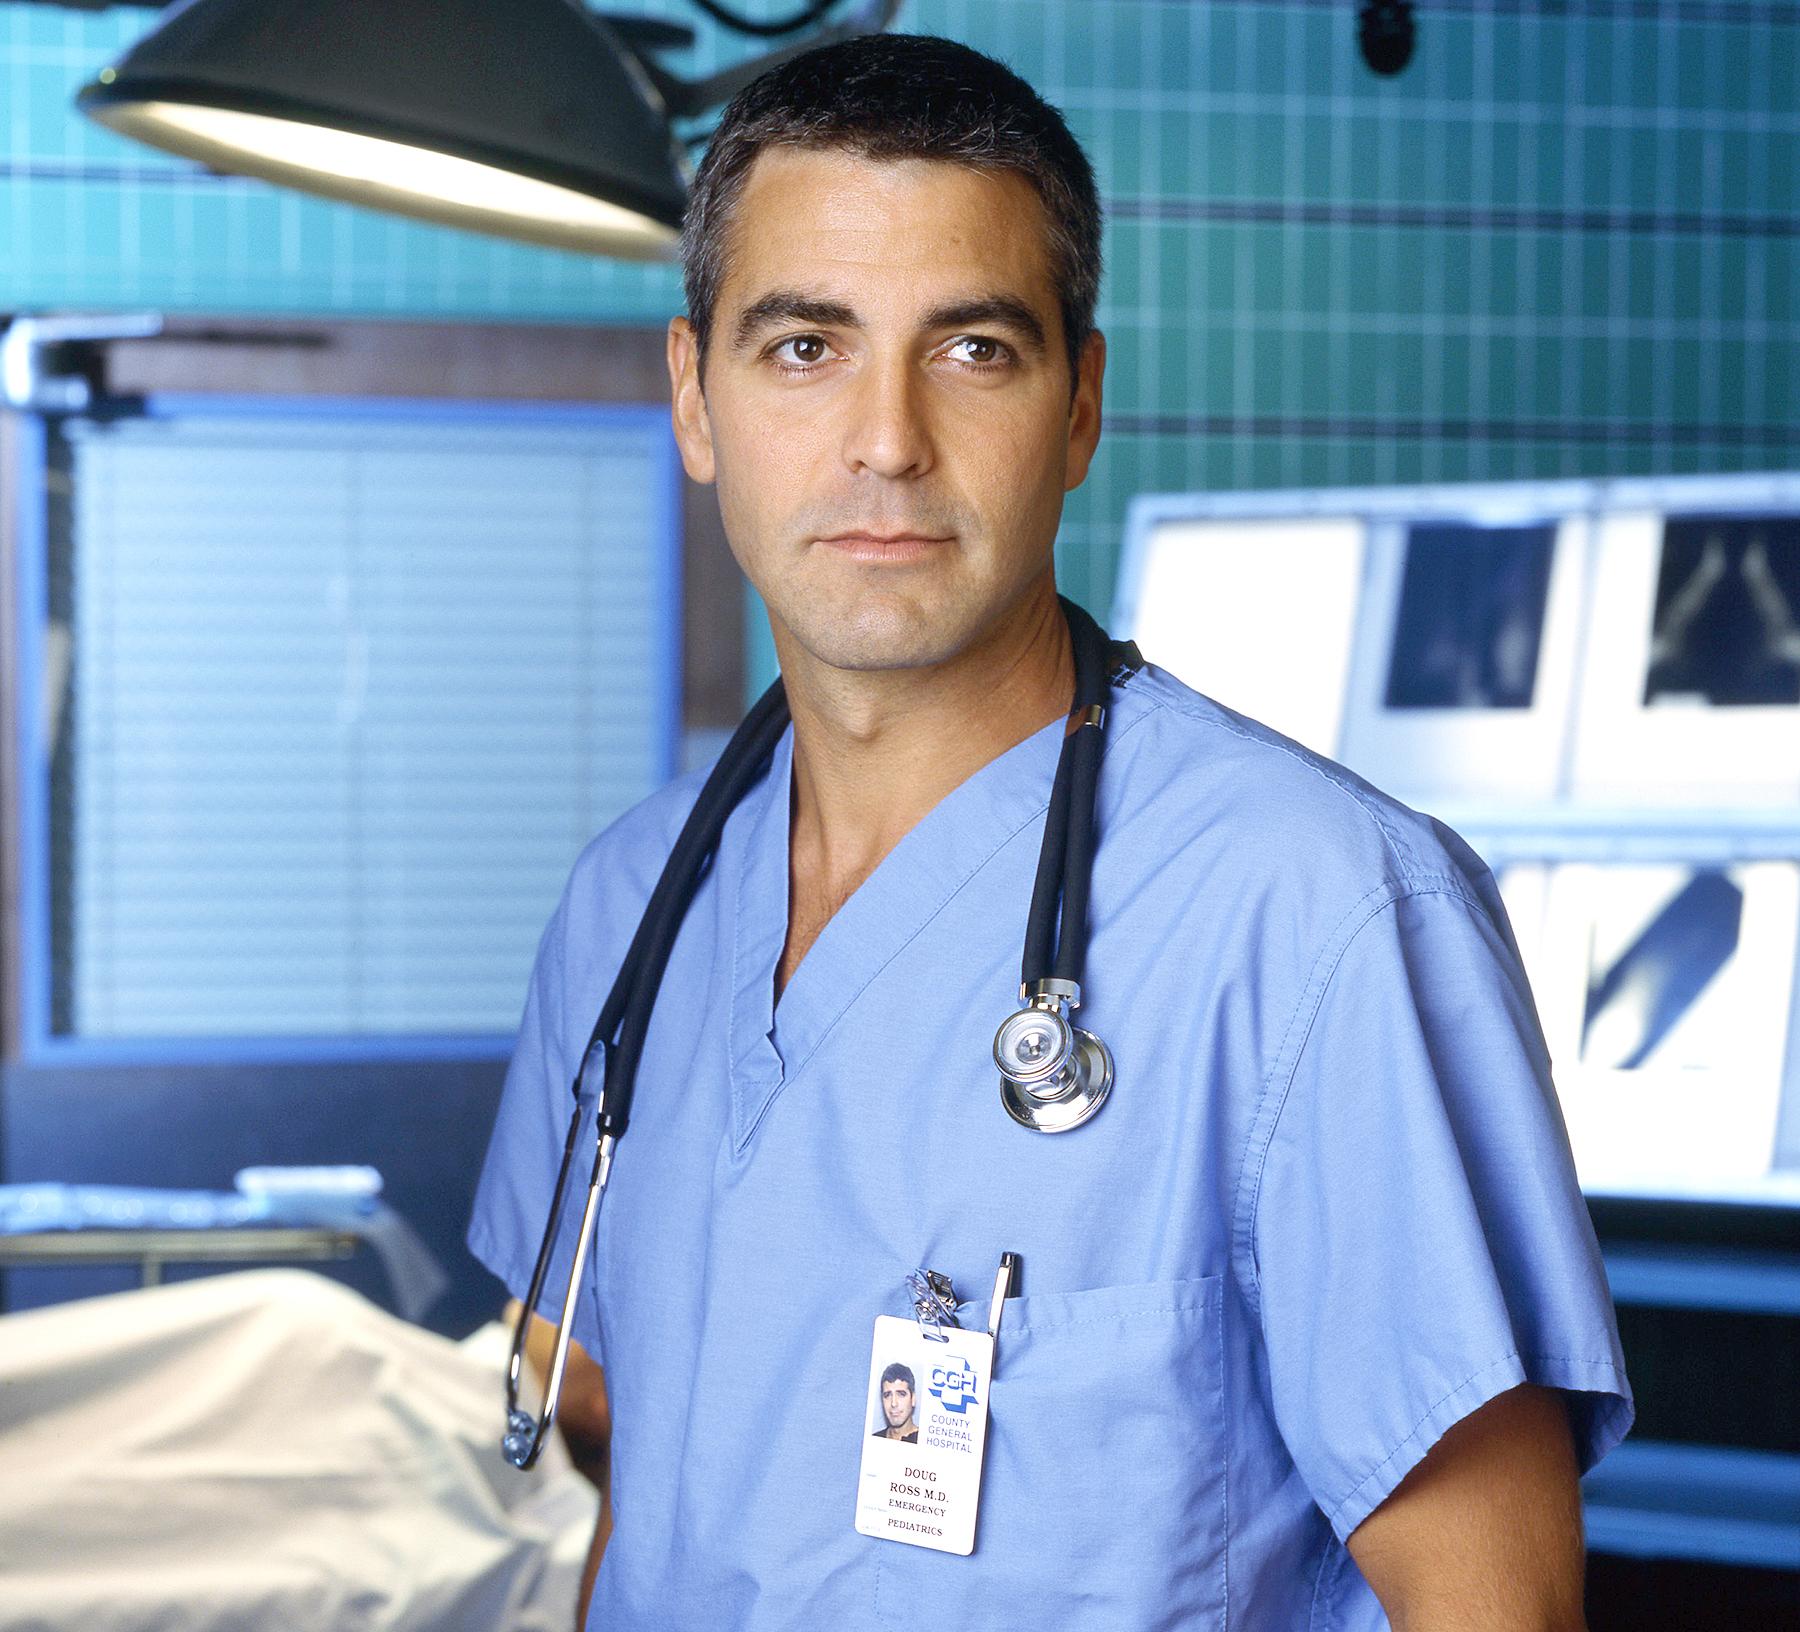 George Clooney as Dr. Doug Ross on ER.